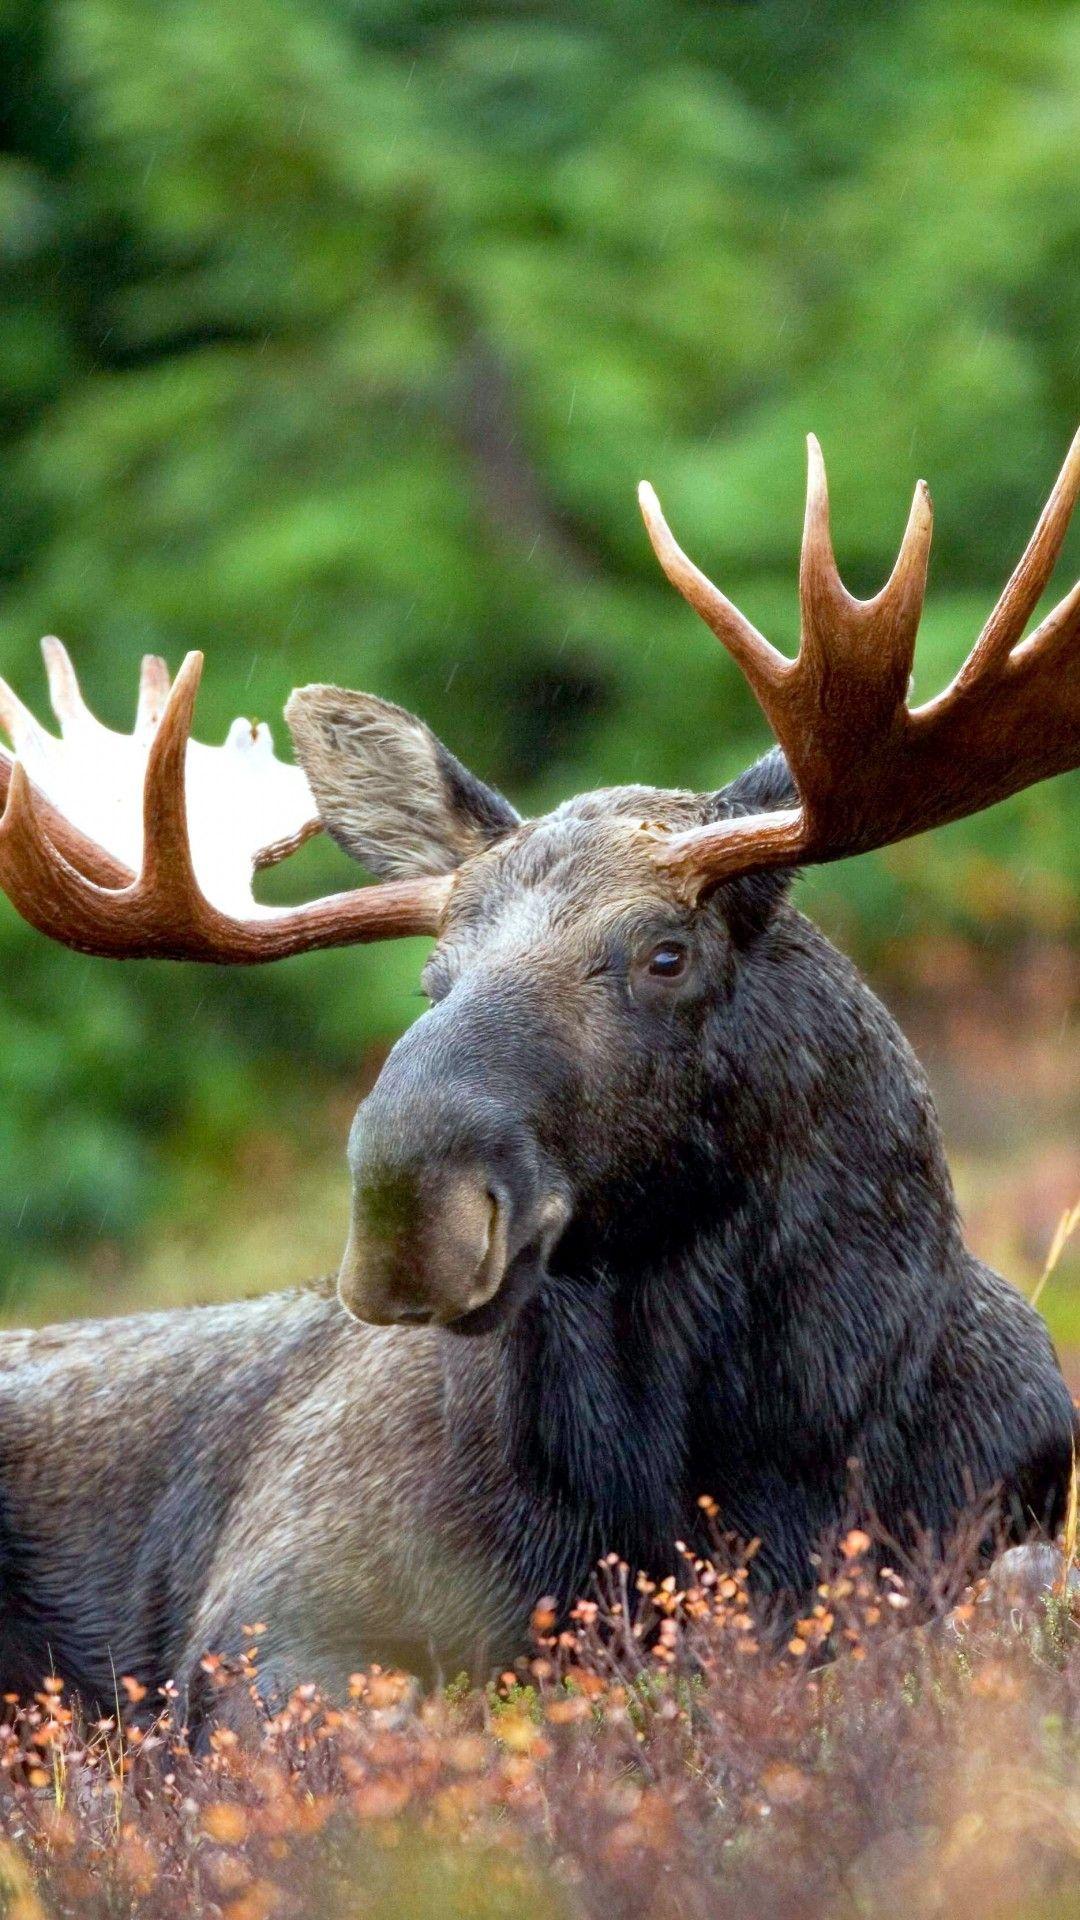 Moose Rest Iphone 6 Plus Wallpaper Hd Wallpapers Animals Animals Beautiful Animals Wild